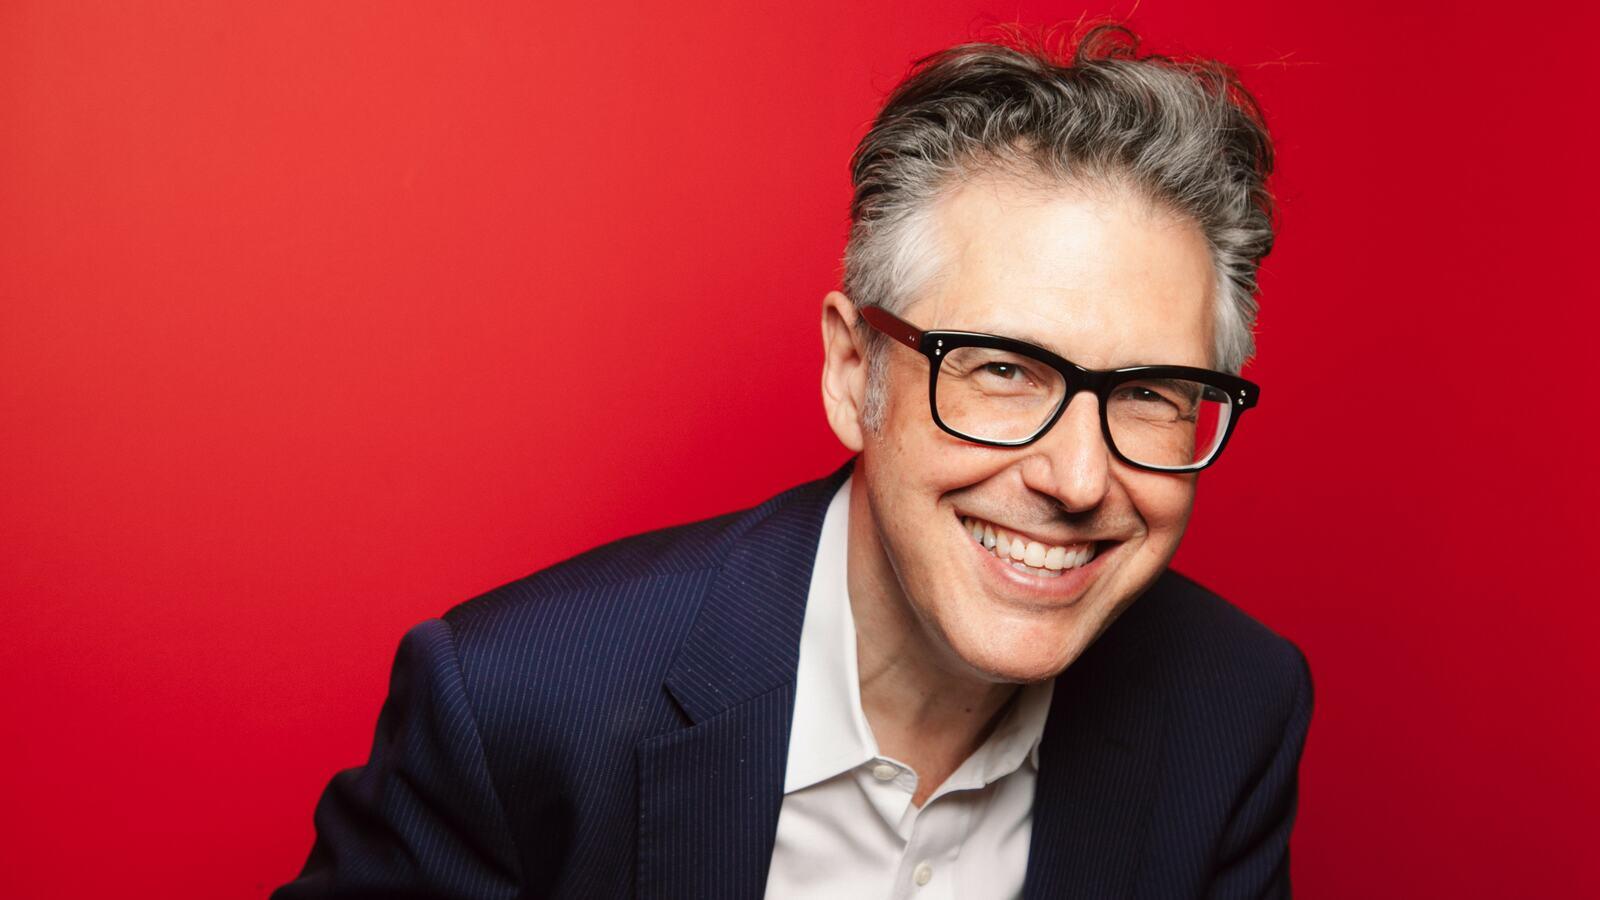 Ira Glass, radio personality